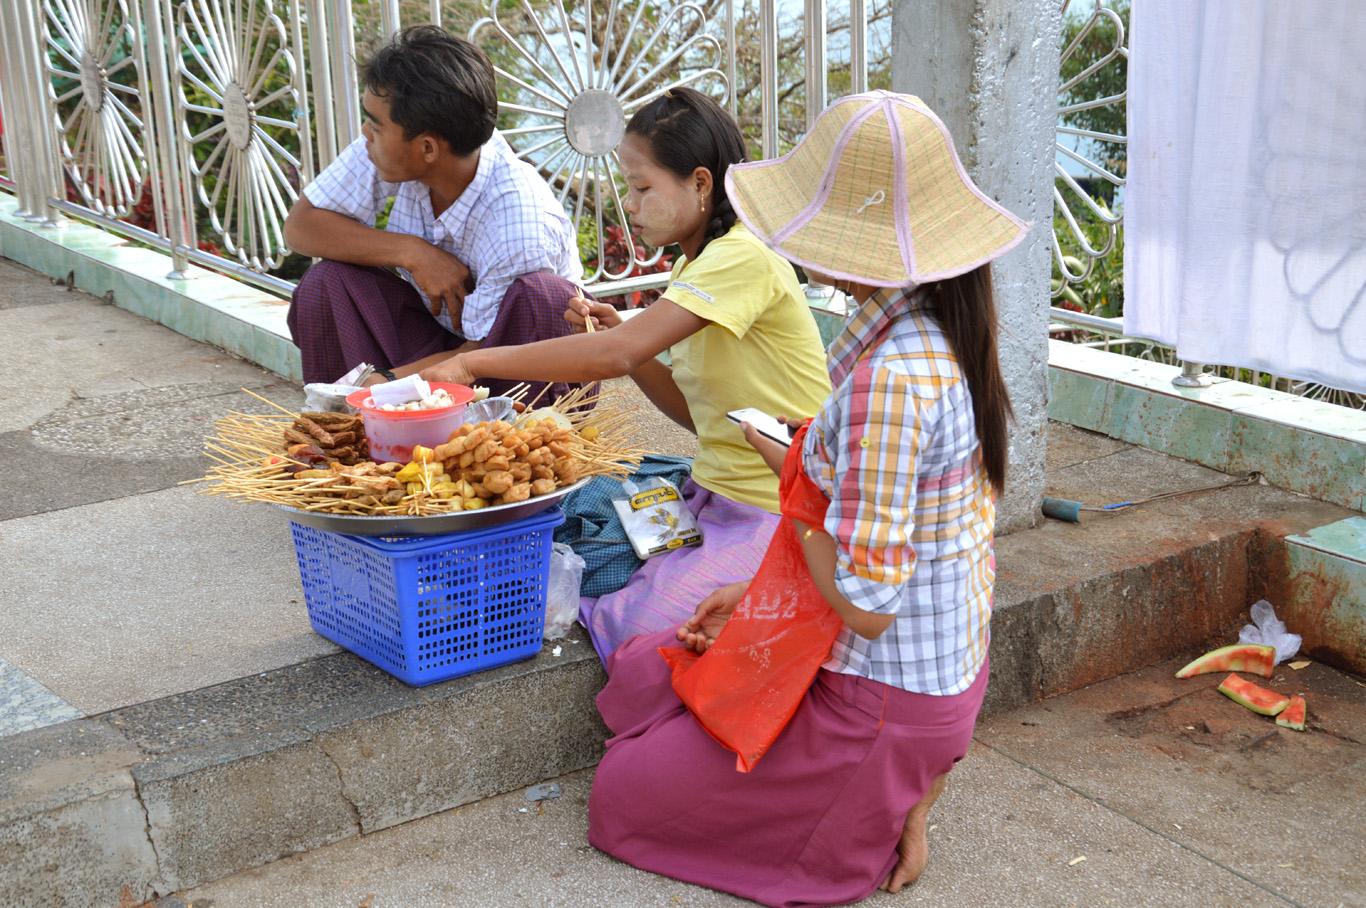 Vendors selling snacks